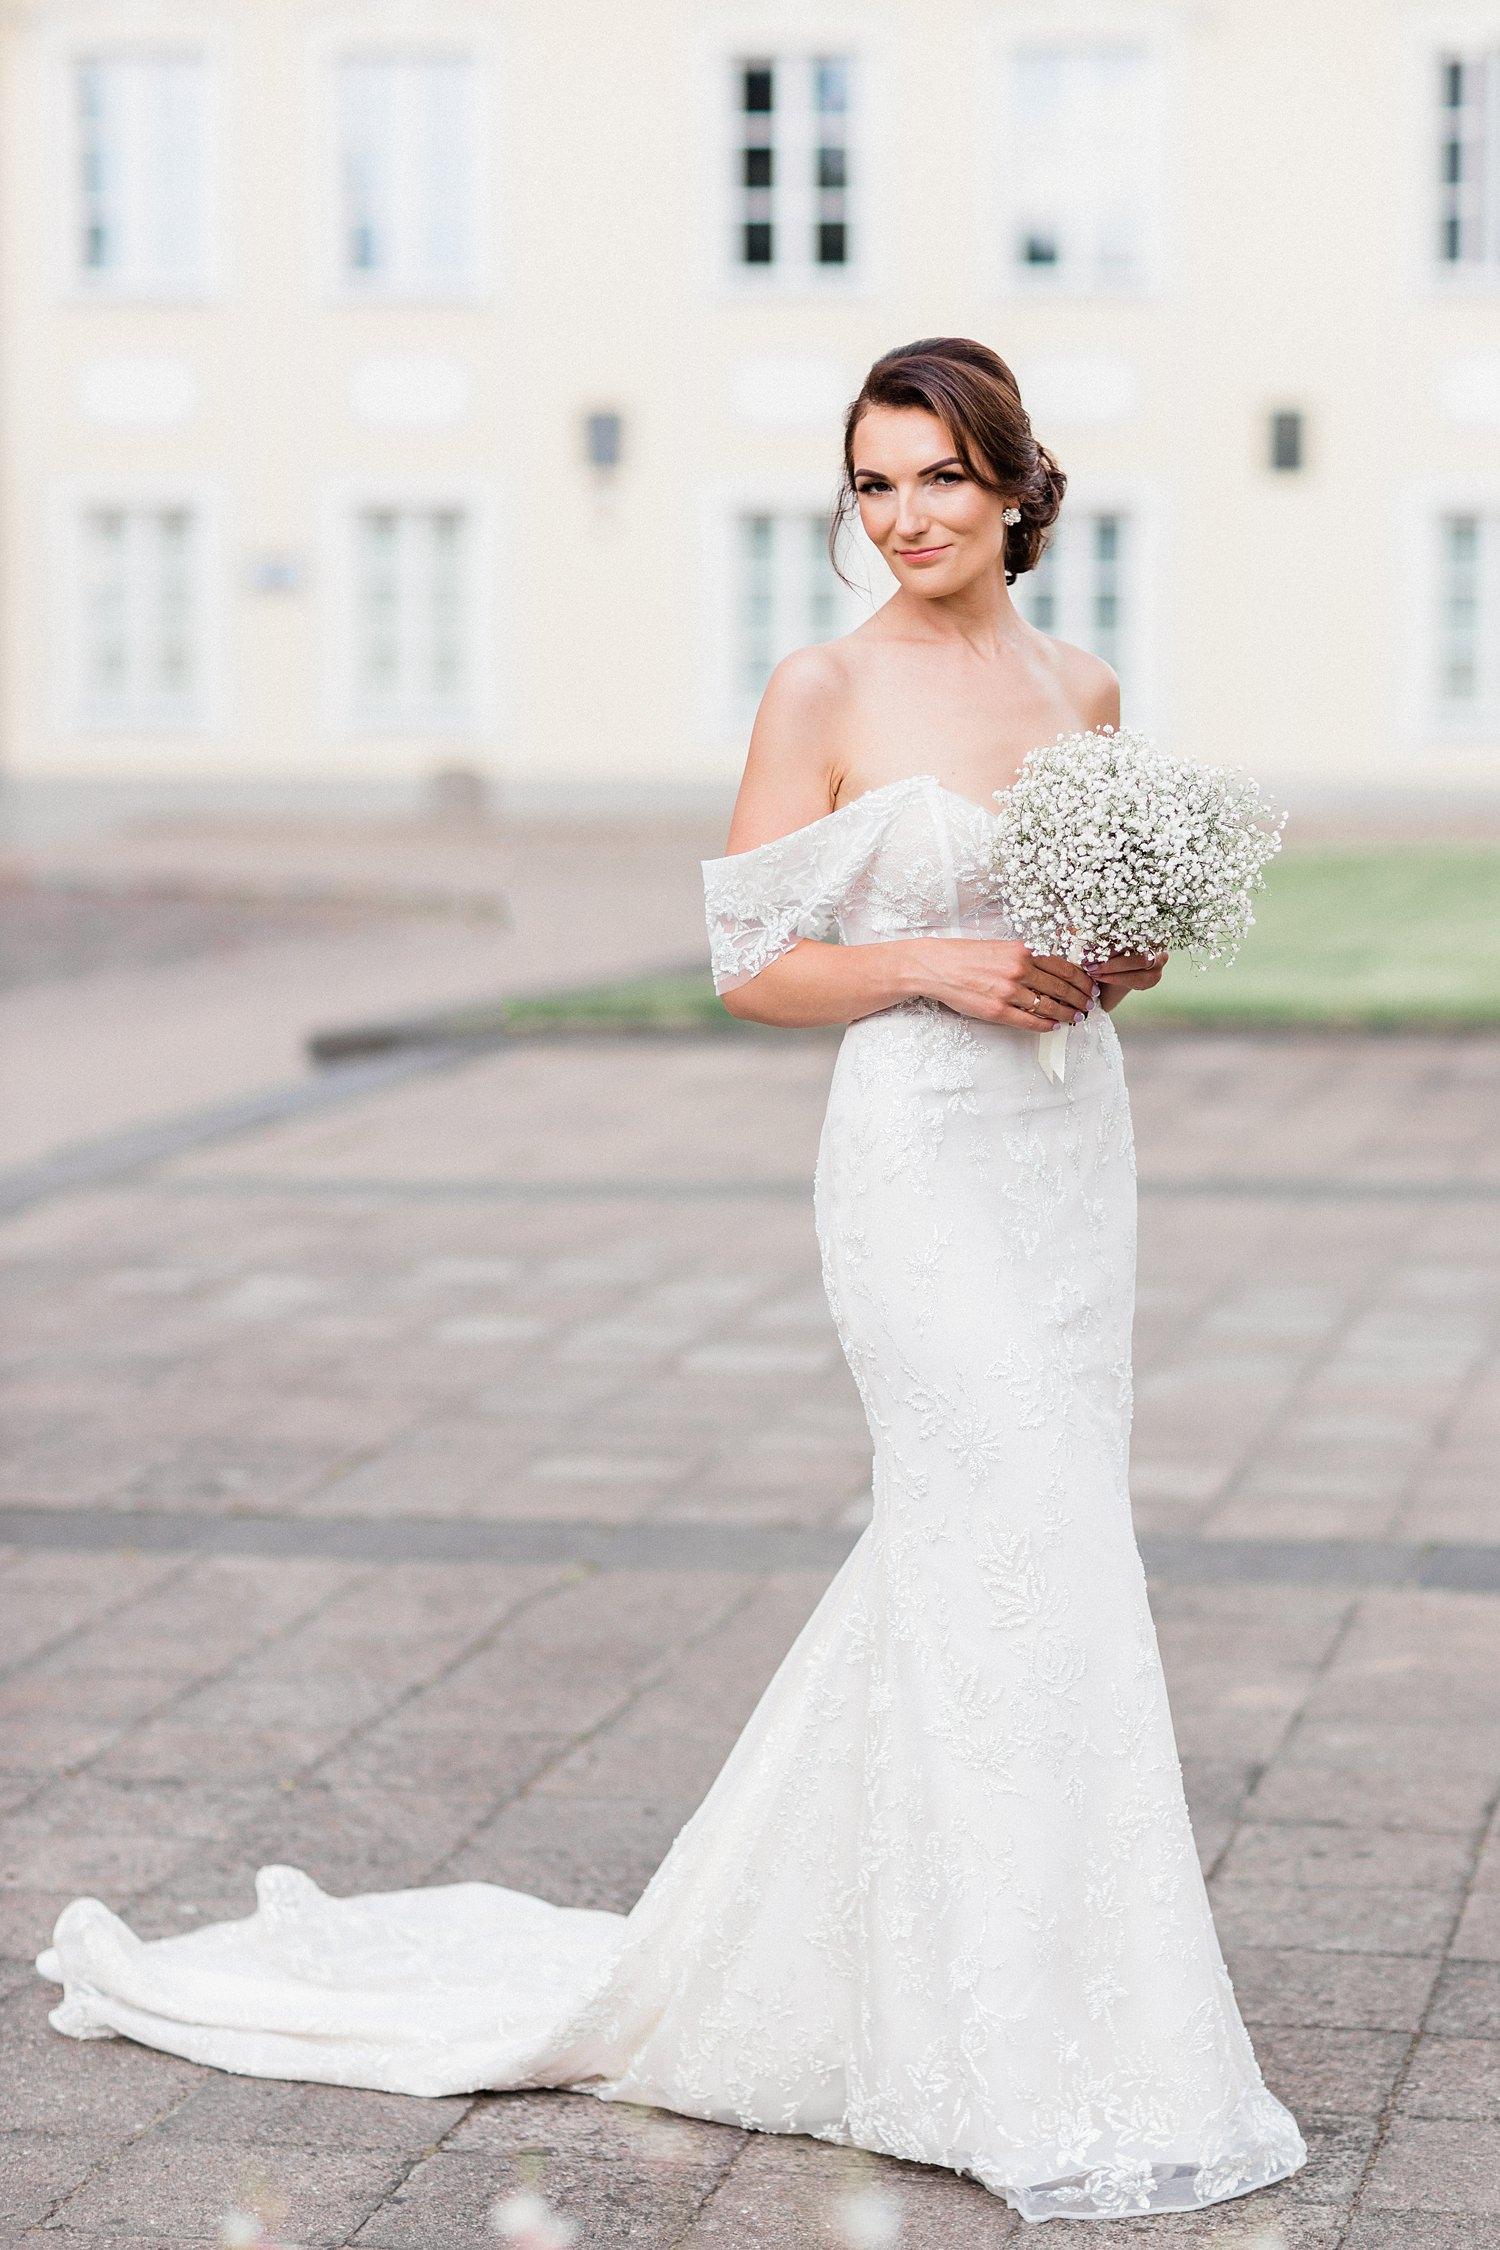 Elegant bride pose with bouquet - photo by Jurgita Lukos Photography